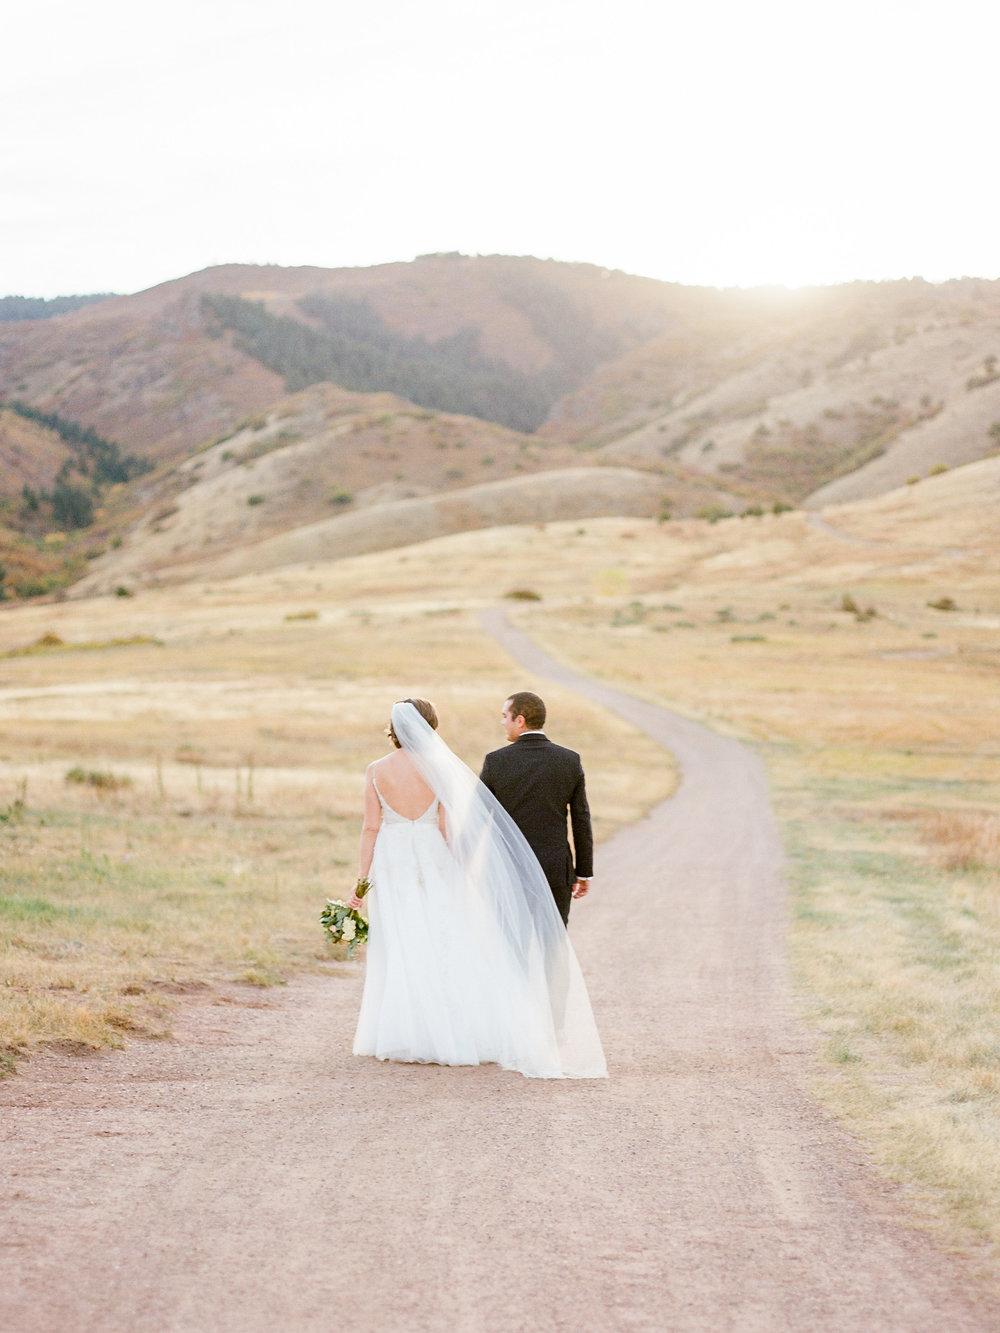 madeline-roberto-wedding-bride-groom-86.jpg